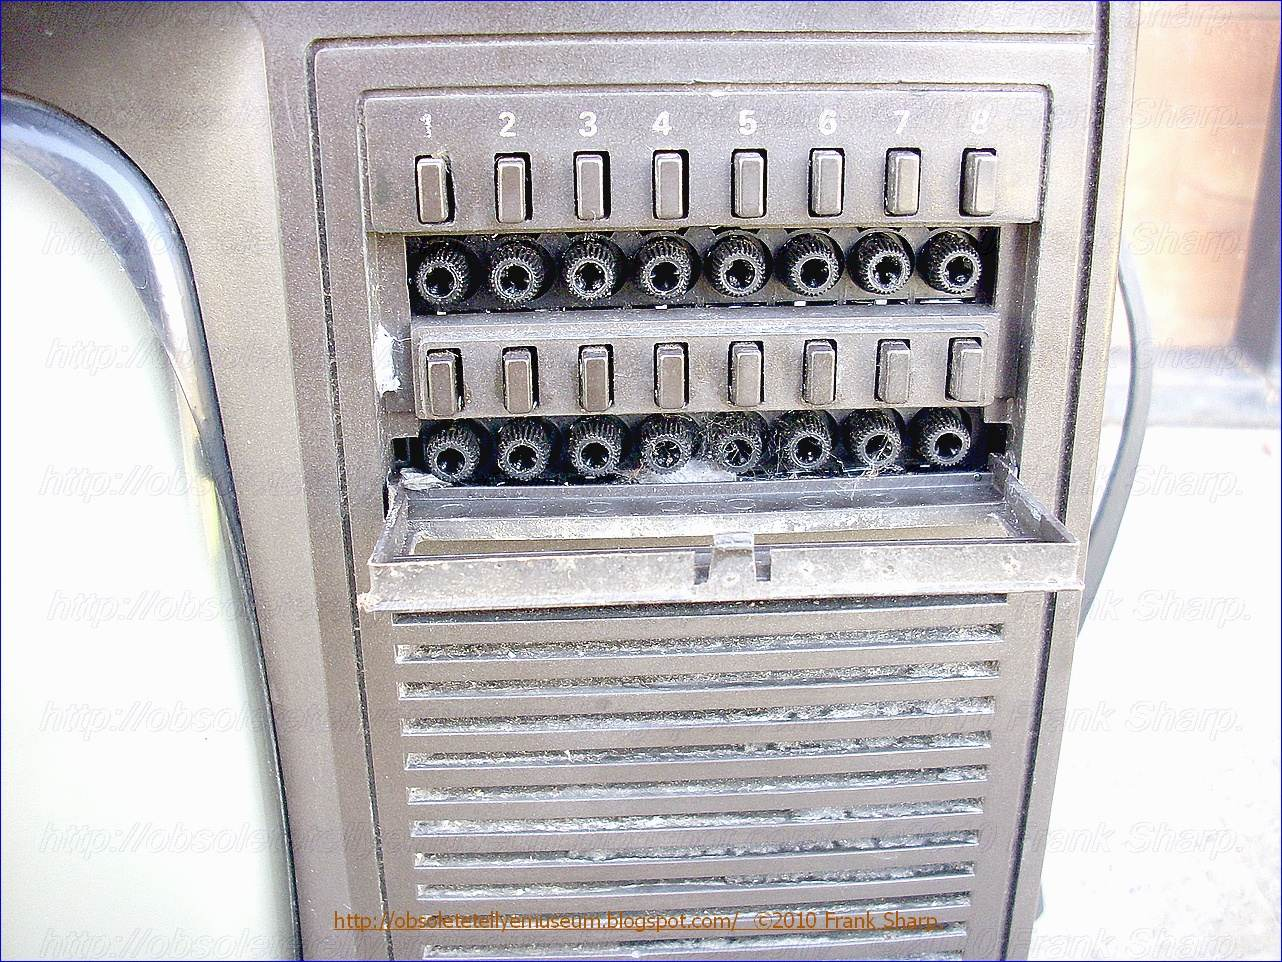 Obsolete Technology Tellye !: GRUNDIG P1223 / 16 YEAR 1981